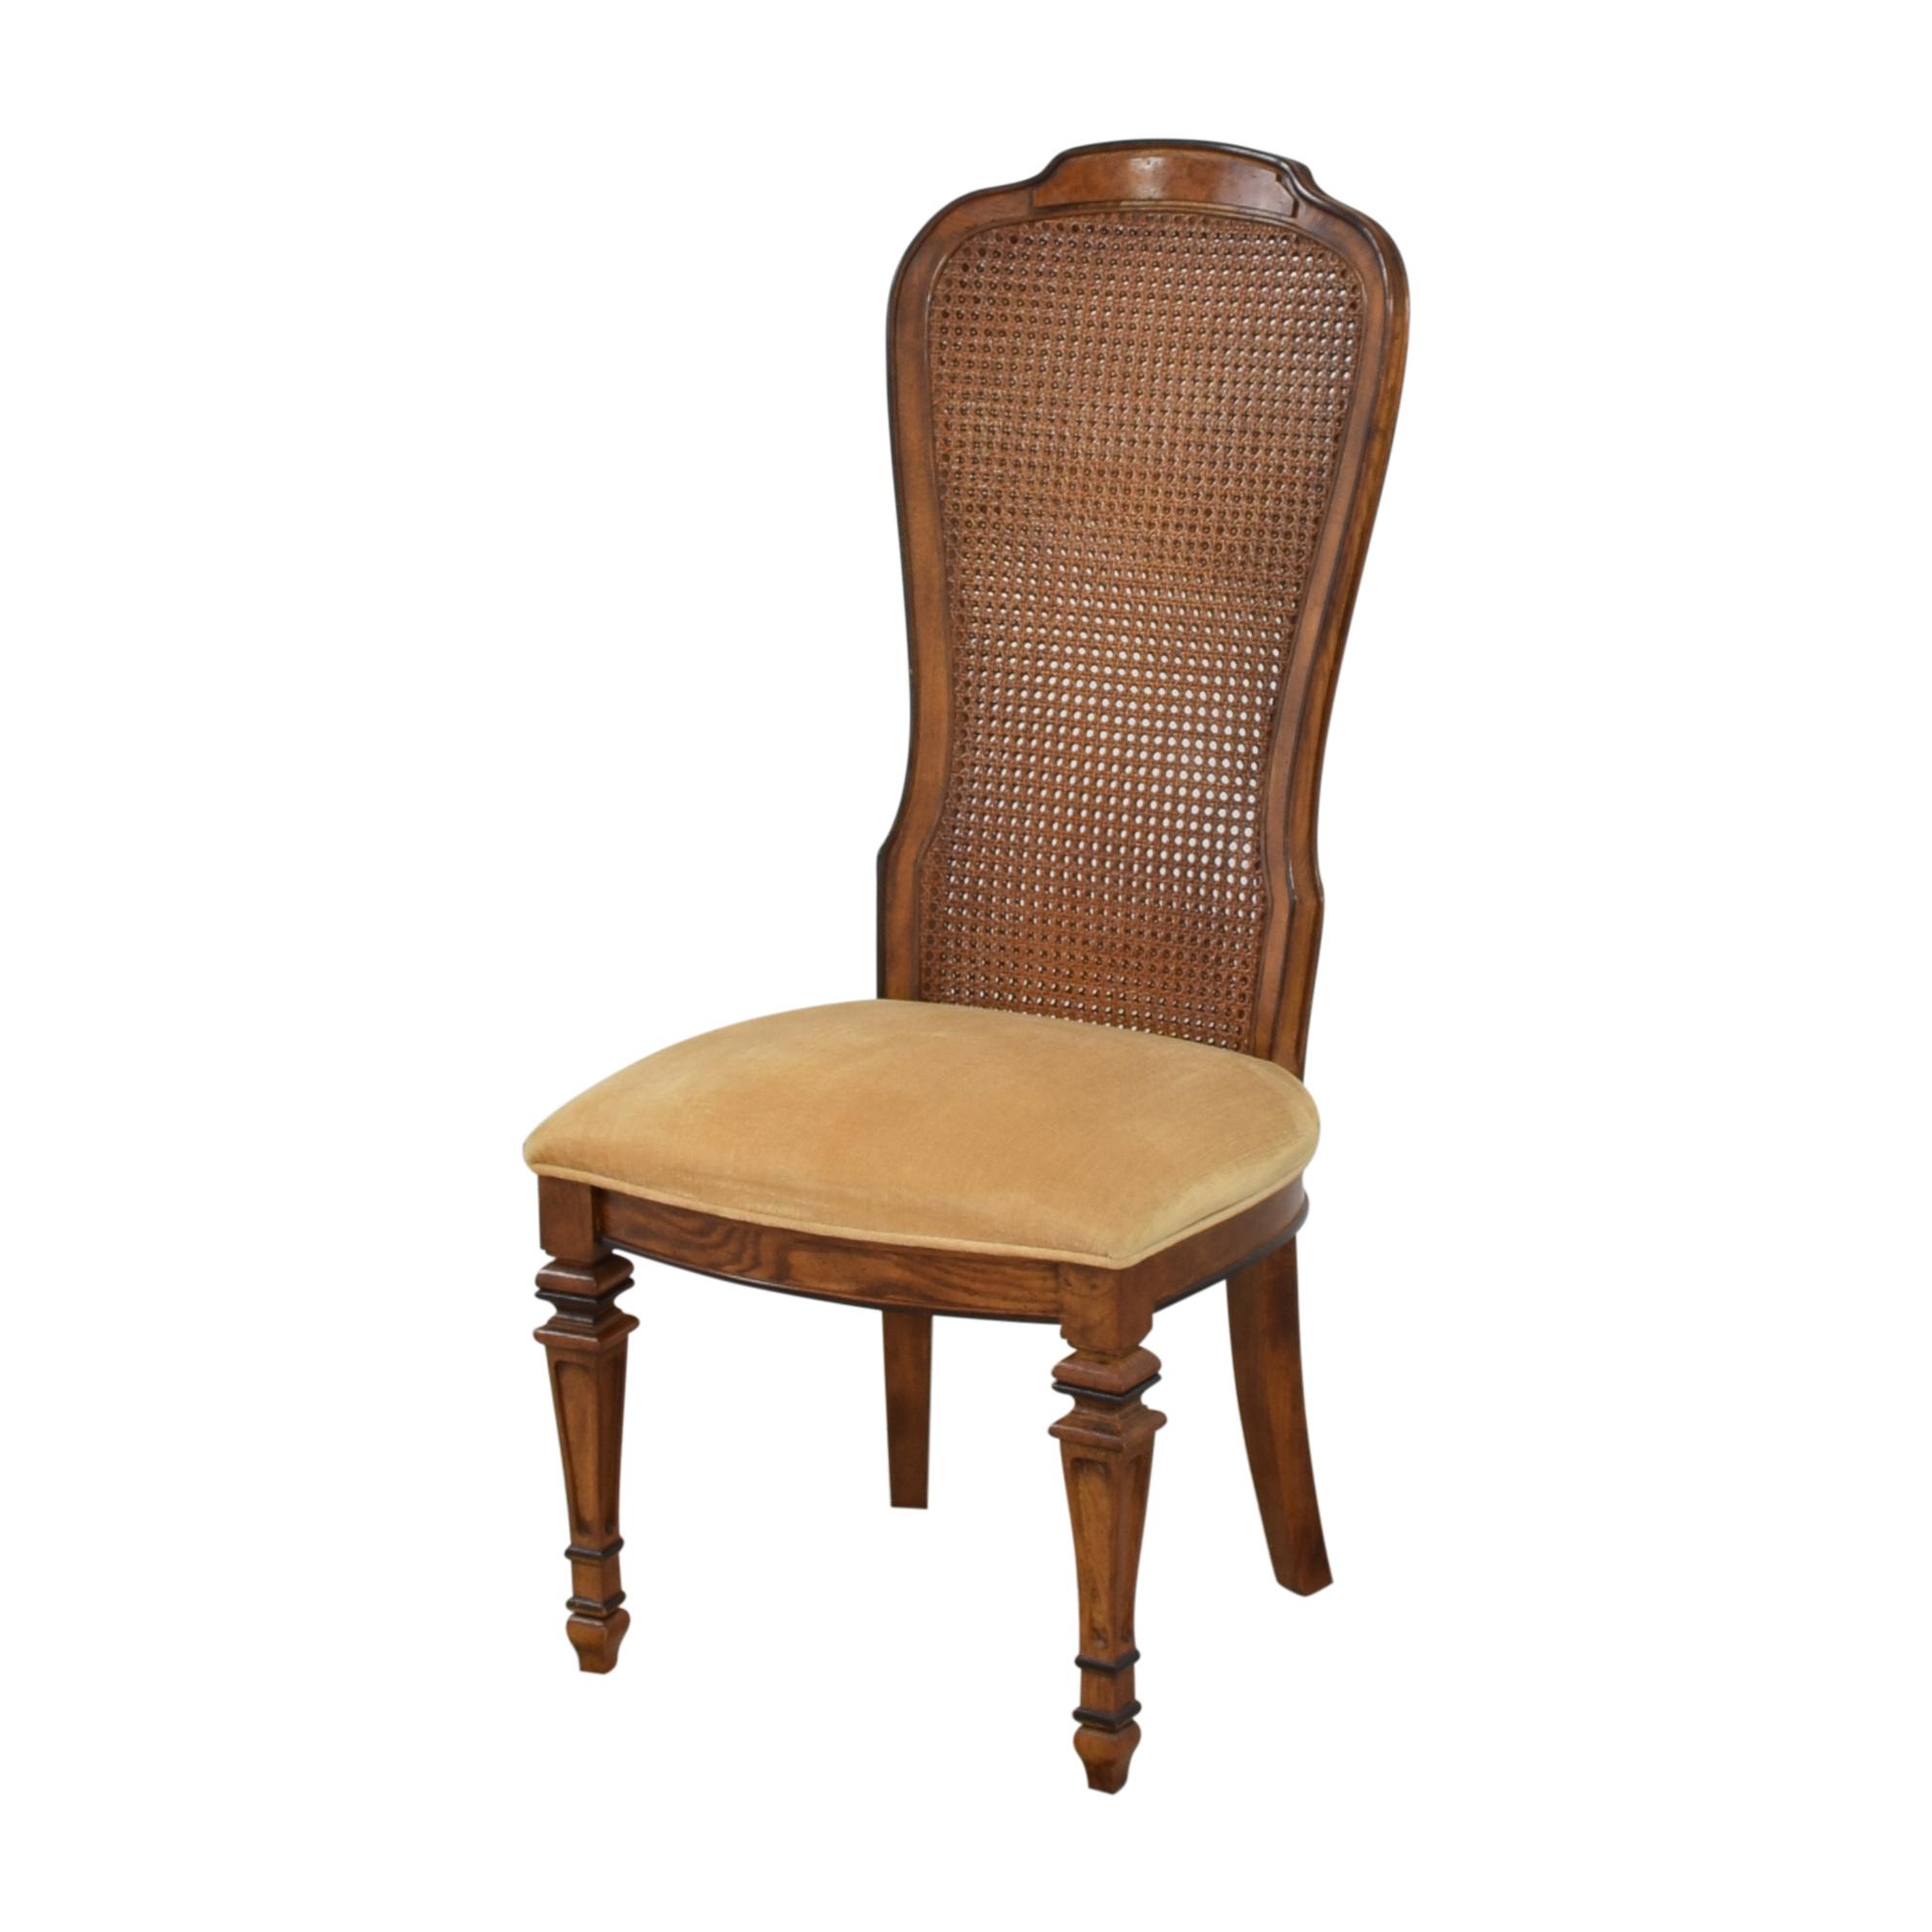 shop Bernhardt Upholstered Dining Chairs Bernhardt